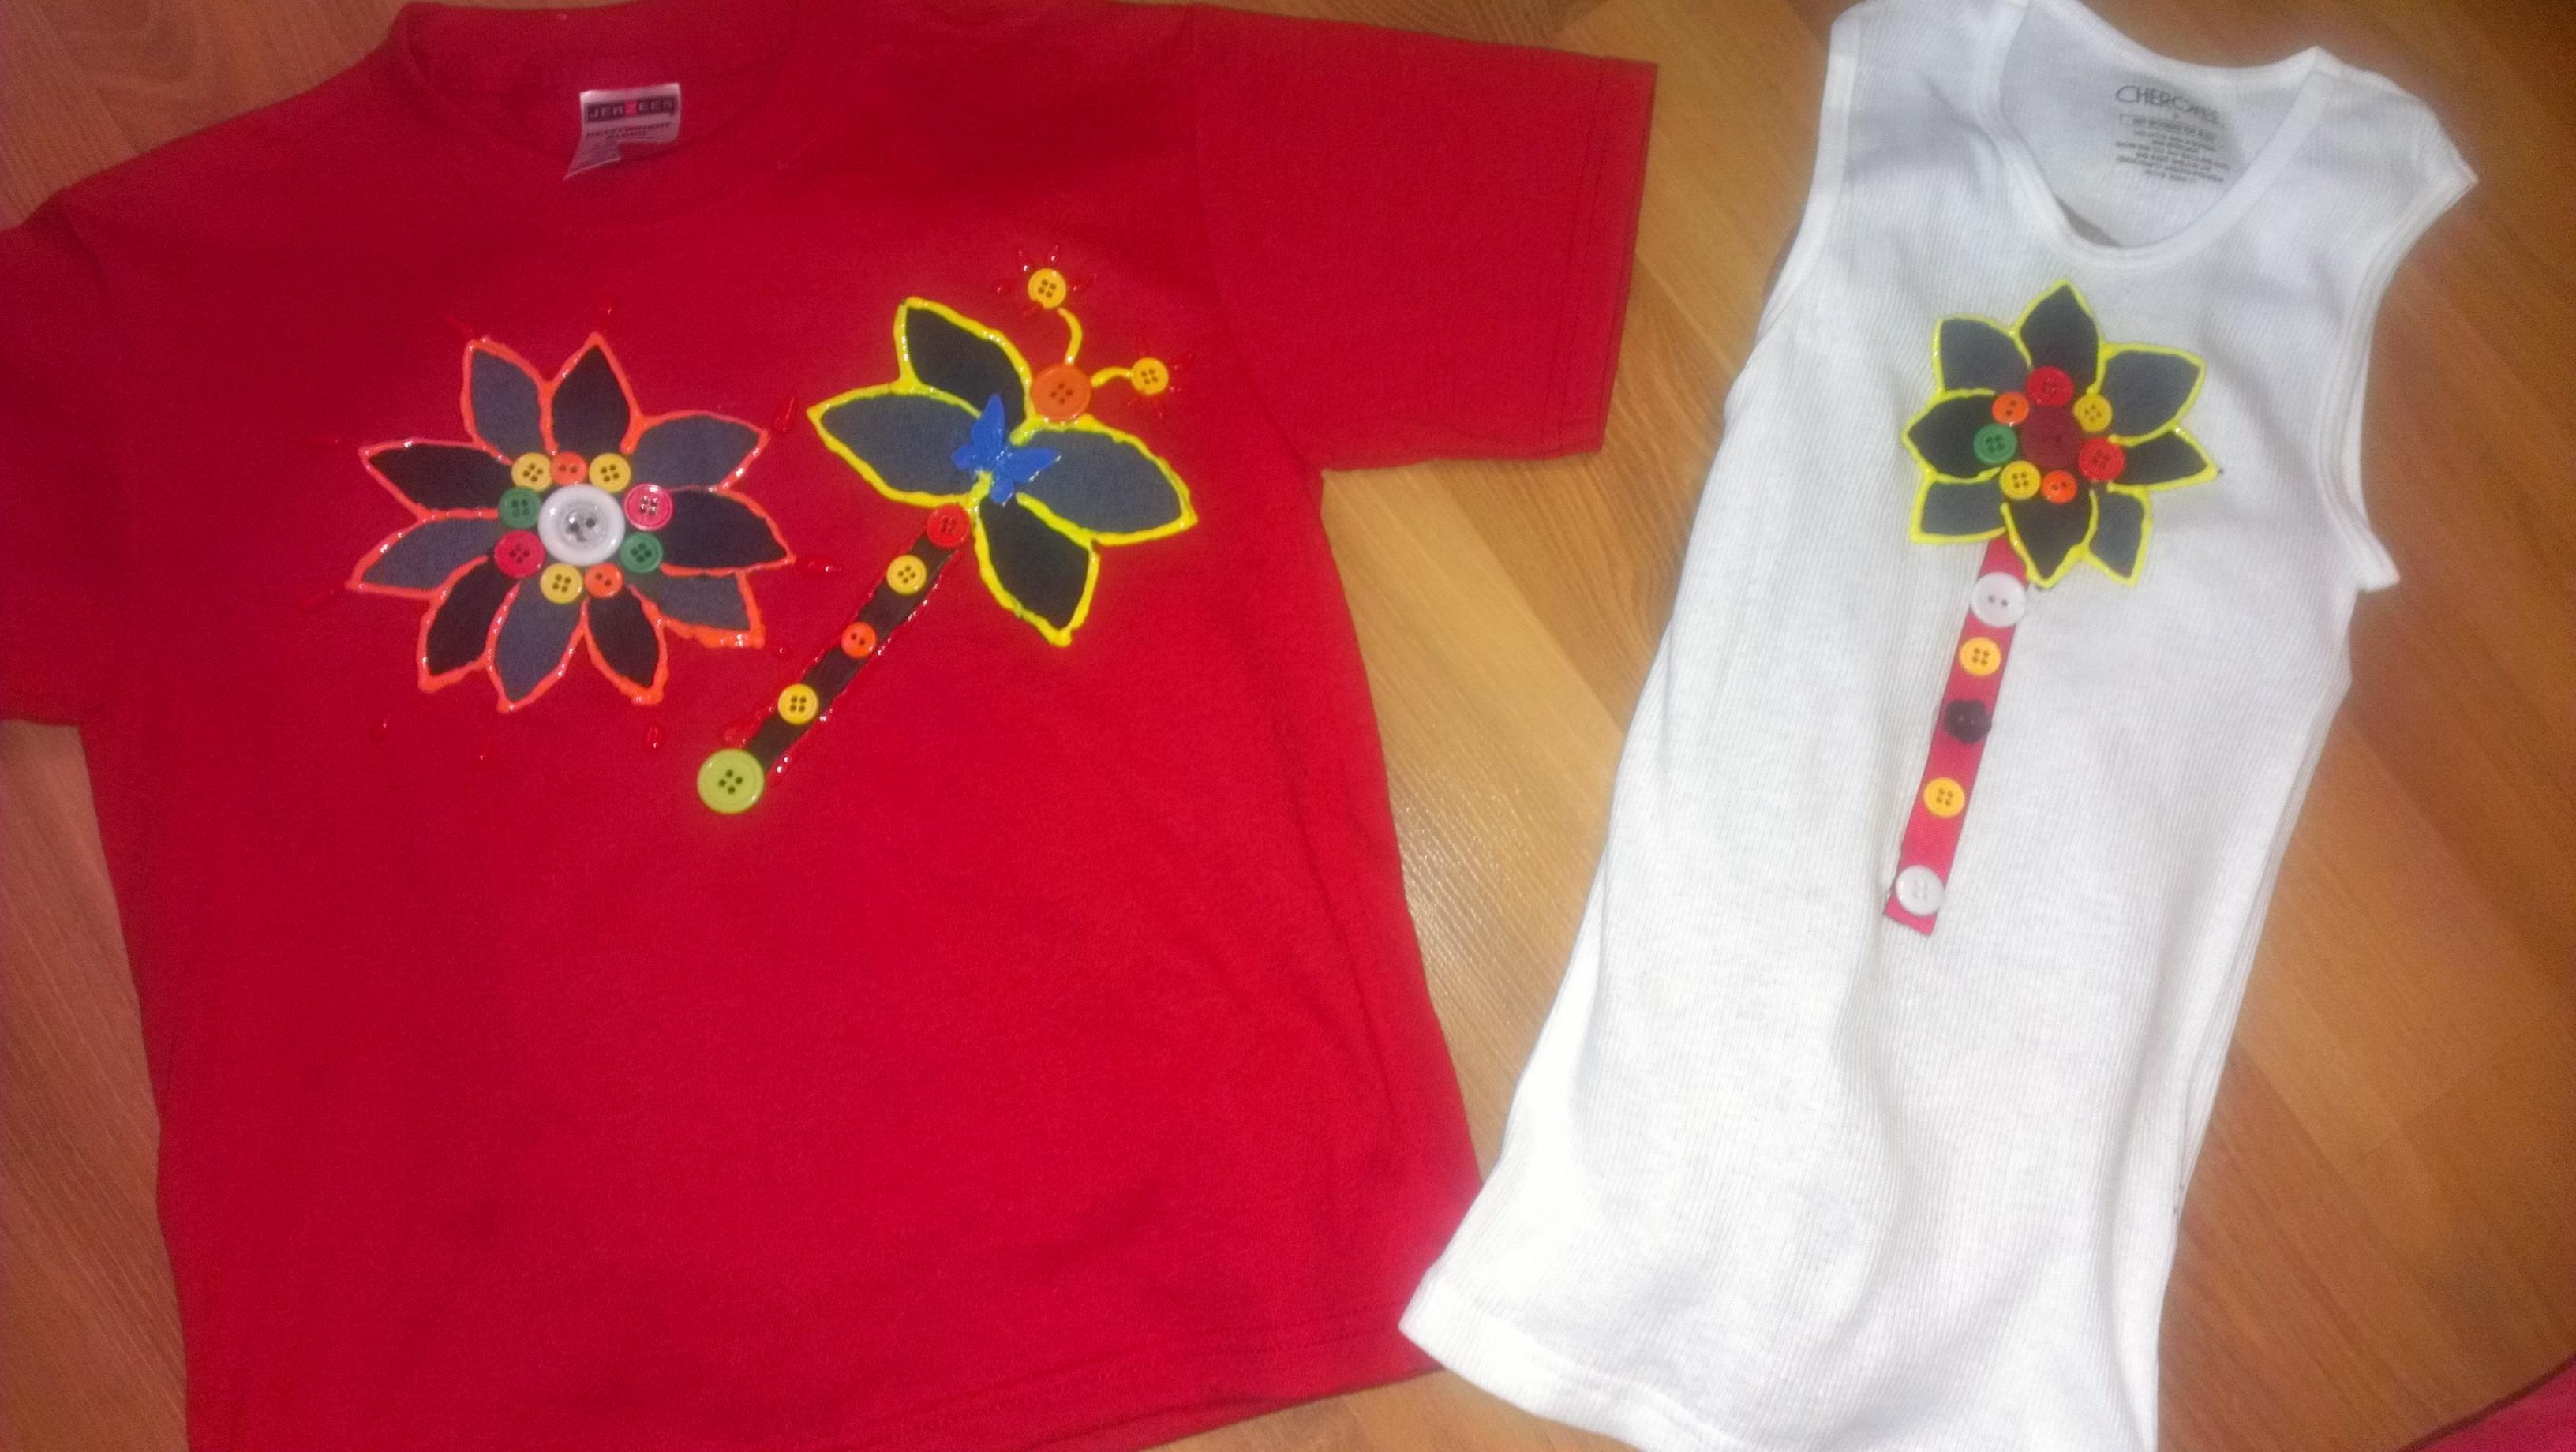 Decorar Camisetas F Cilycotidiano ~ Ideas Para Decorar Camisetas Infantiles